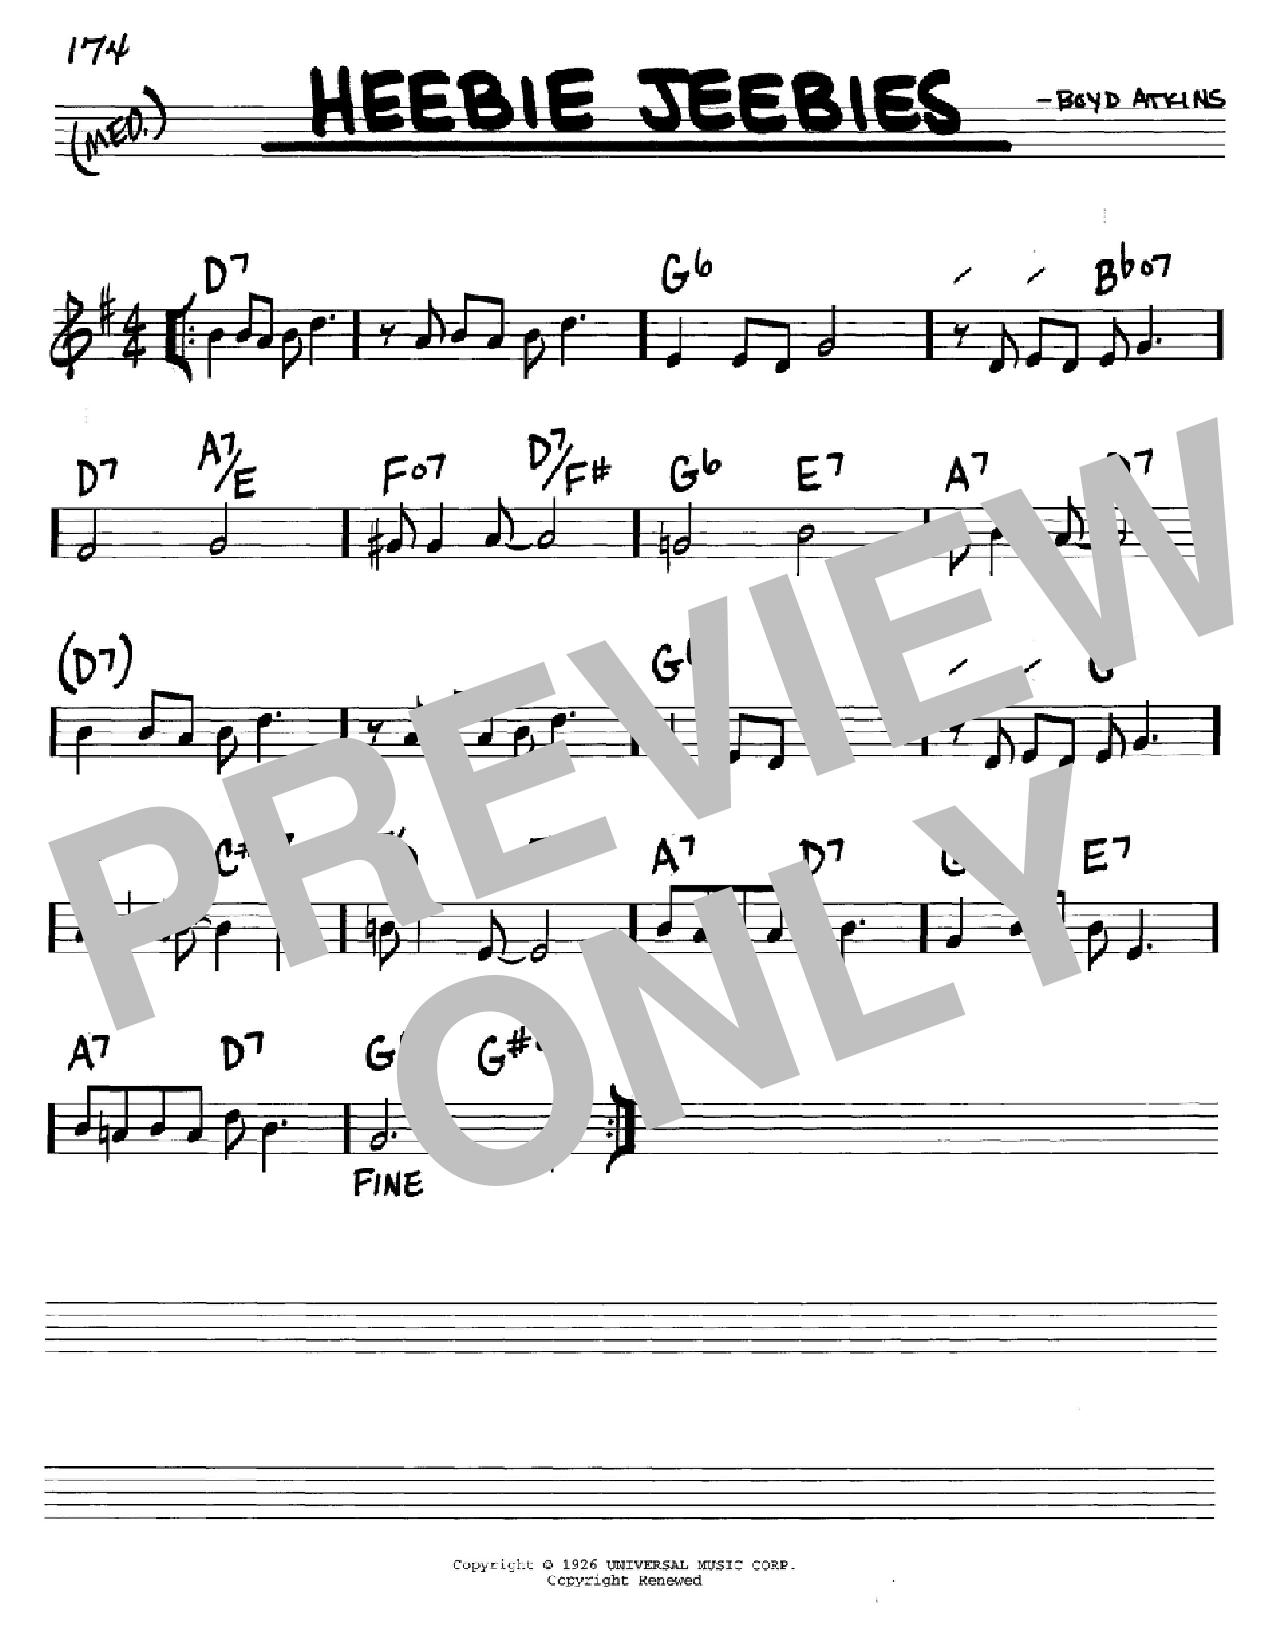 Heebie Jeebies Sheet Music